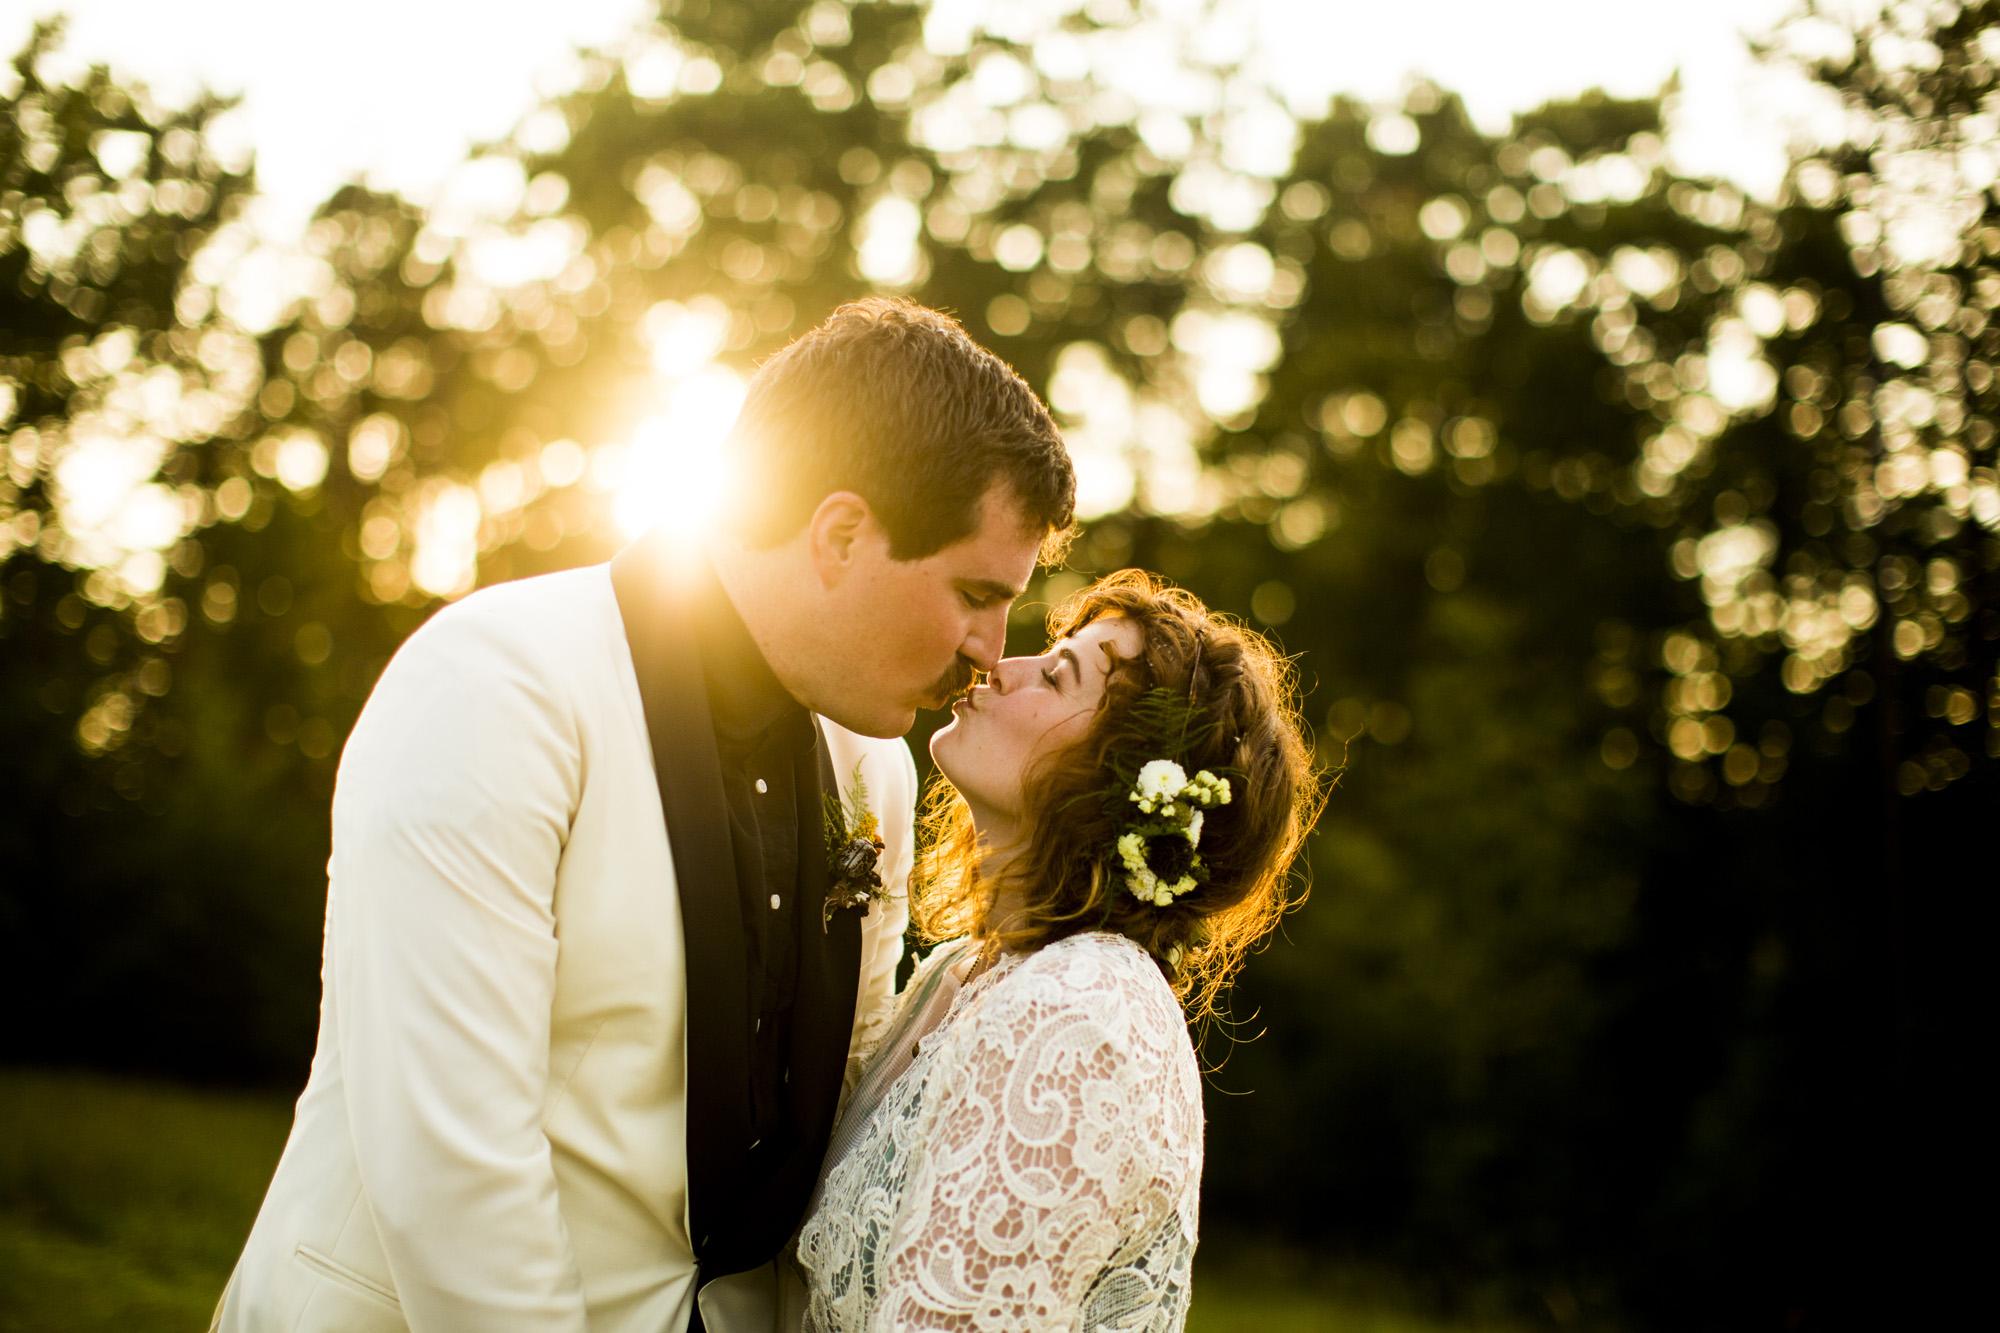 Seriously_Sabrina_Photography_Red_River_Gorge_Kentucky_Wedding_ShawnDana154.jpg